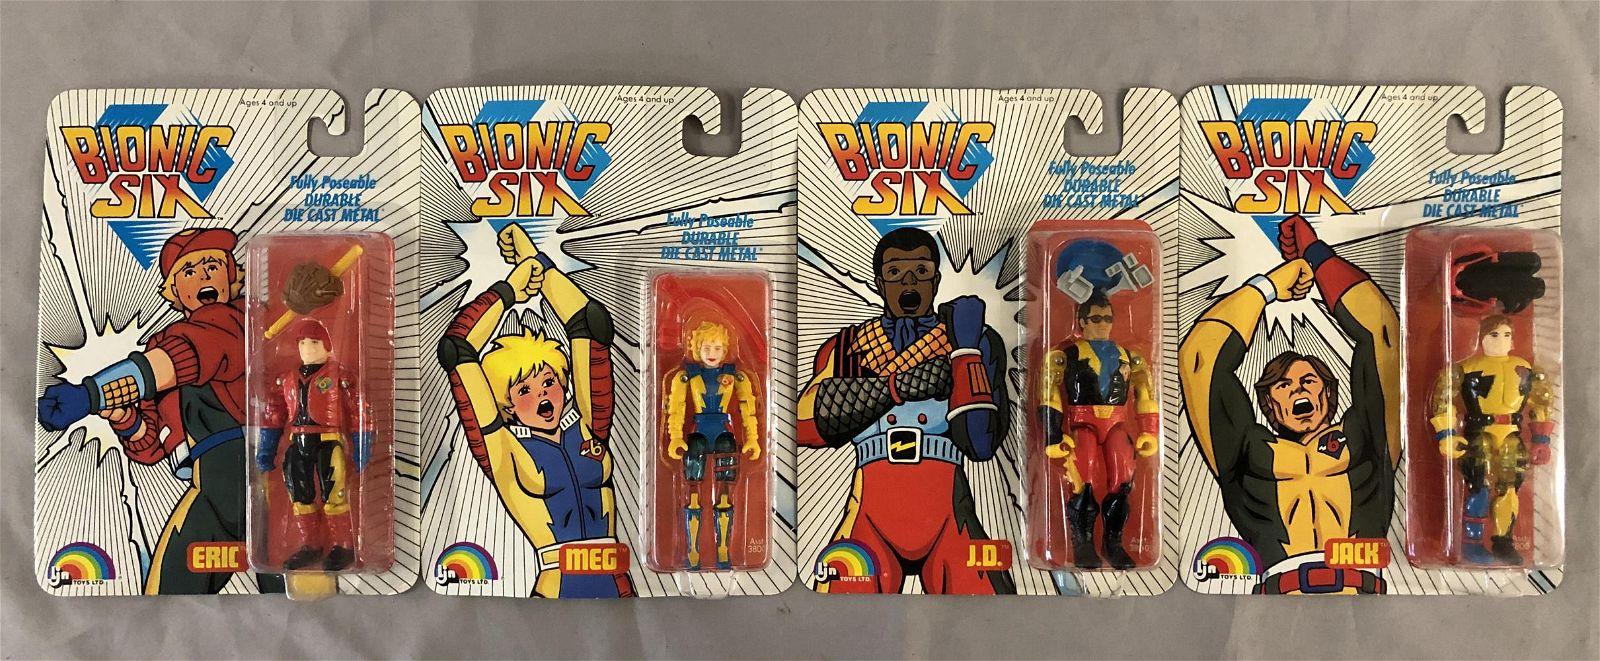 (4) Vtg 1986 Bionic Six MOC Action Figures, LJN